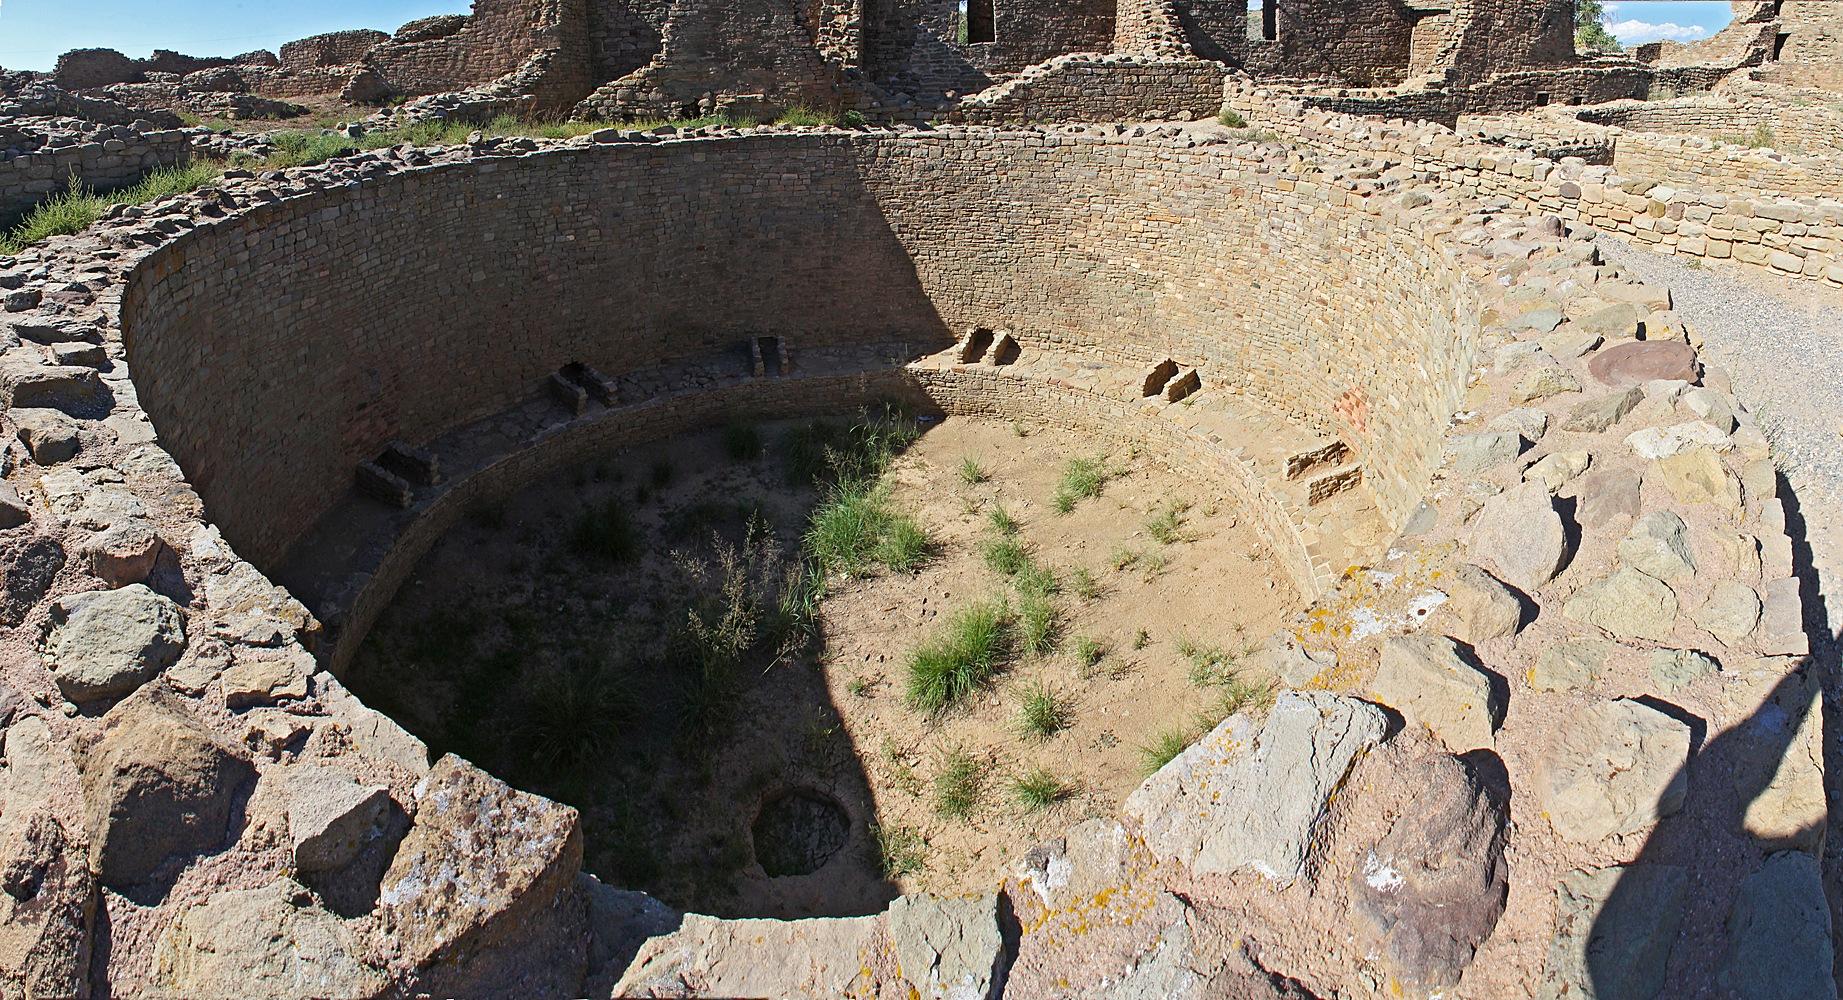 Aztec Ruins by Carl Main